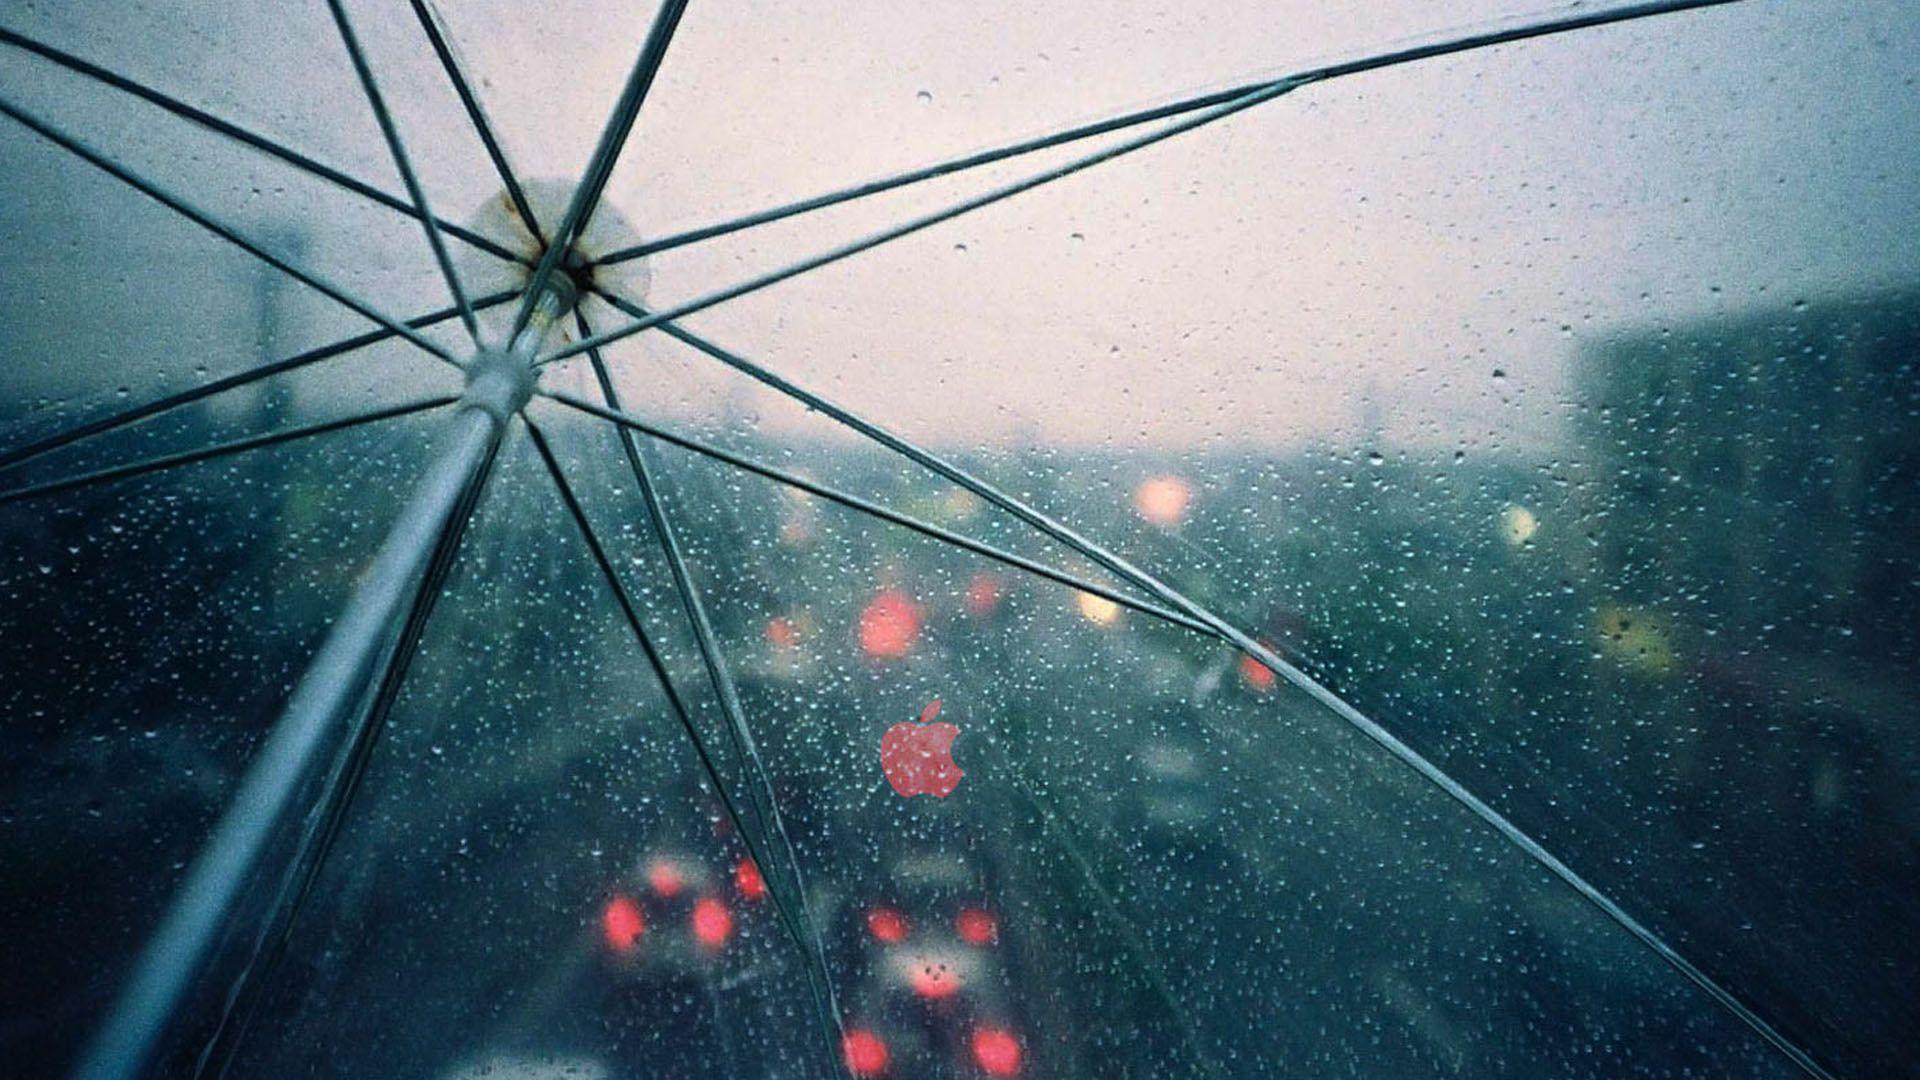 1280x800 25 Raindrops Wallpapers For Your Desktop